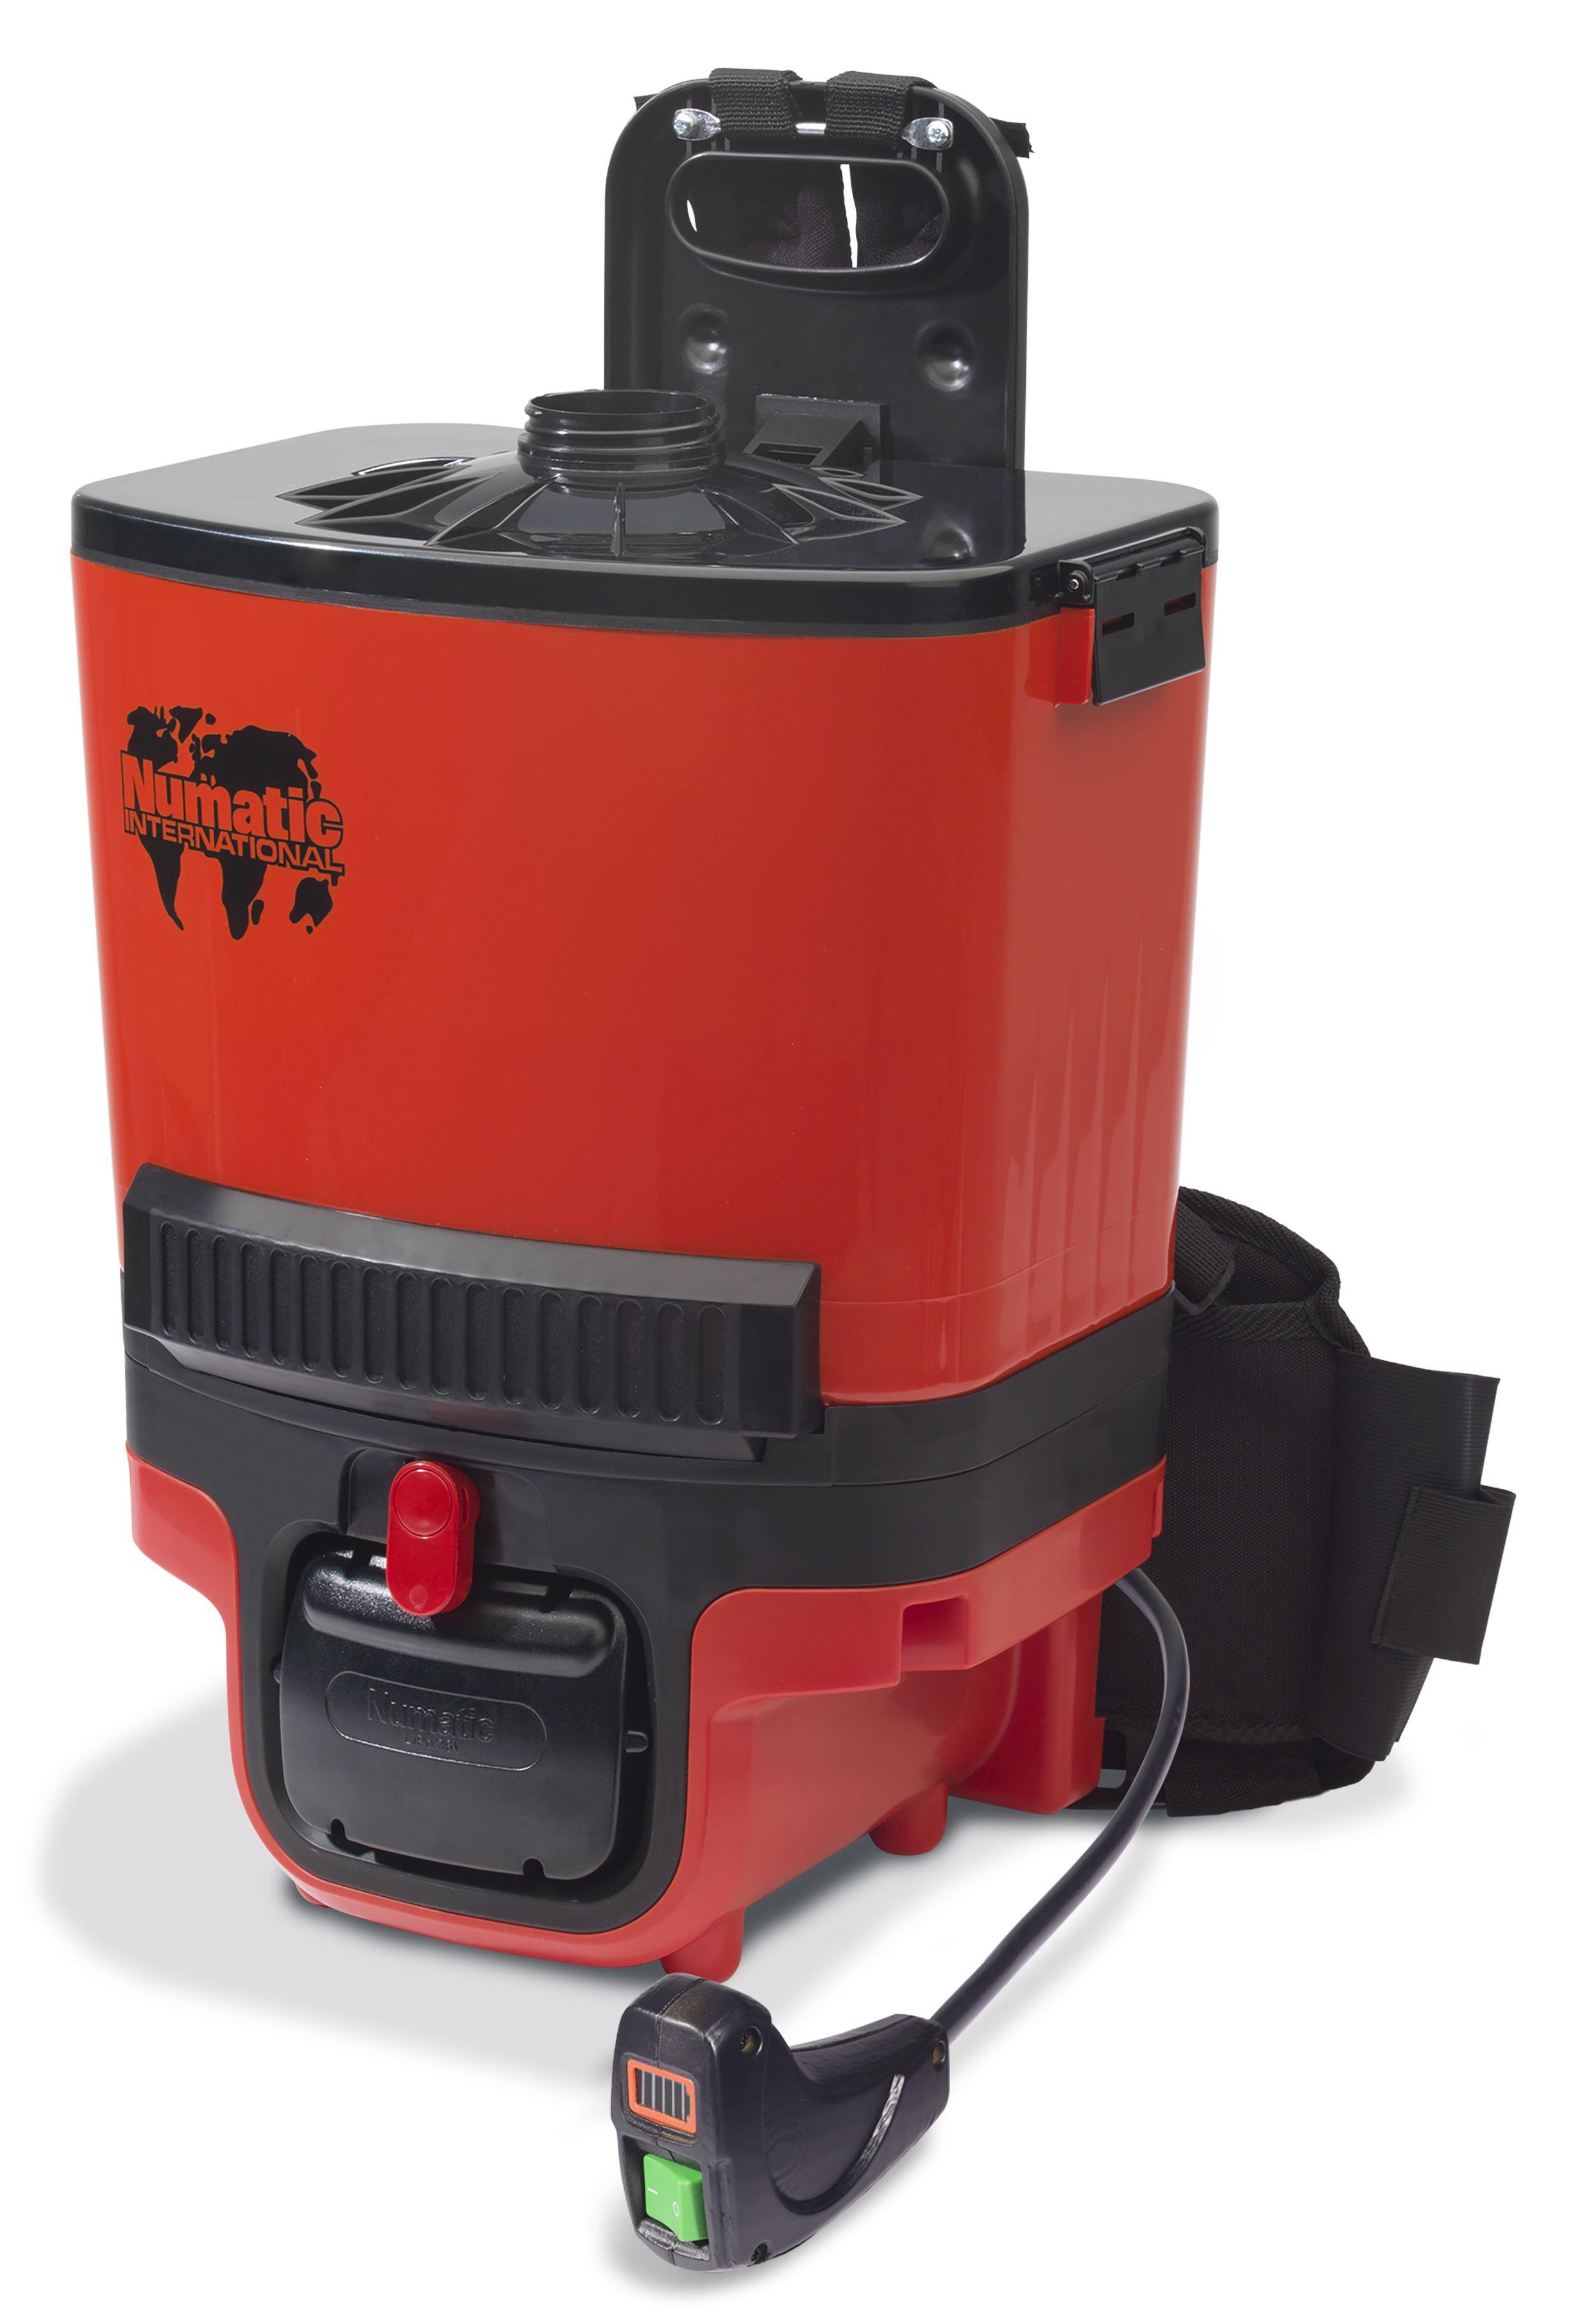 Rugstofzuiger batterij RSB140-1 met kit AA30E